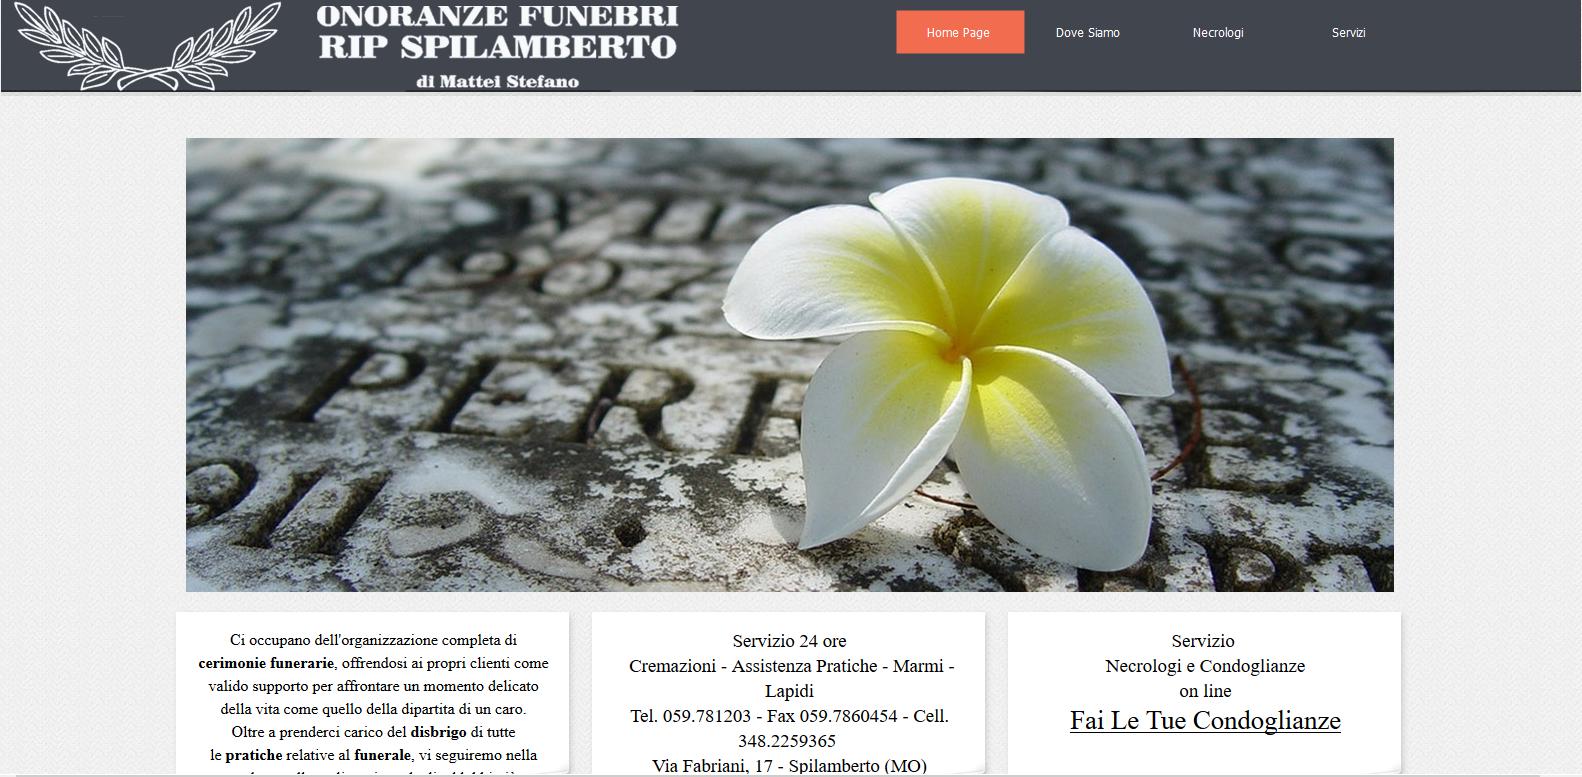 Rip Spilamberto